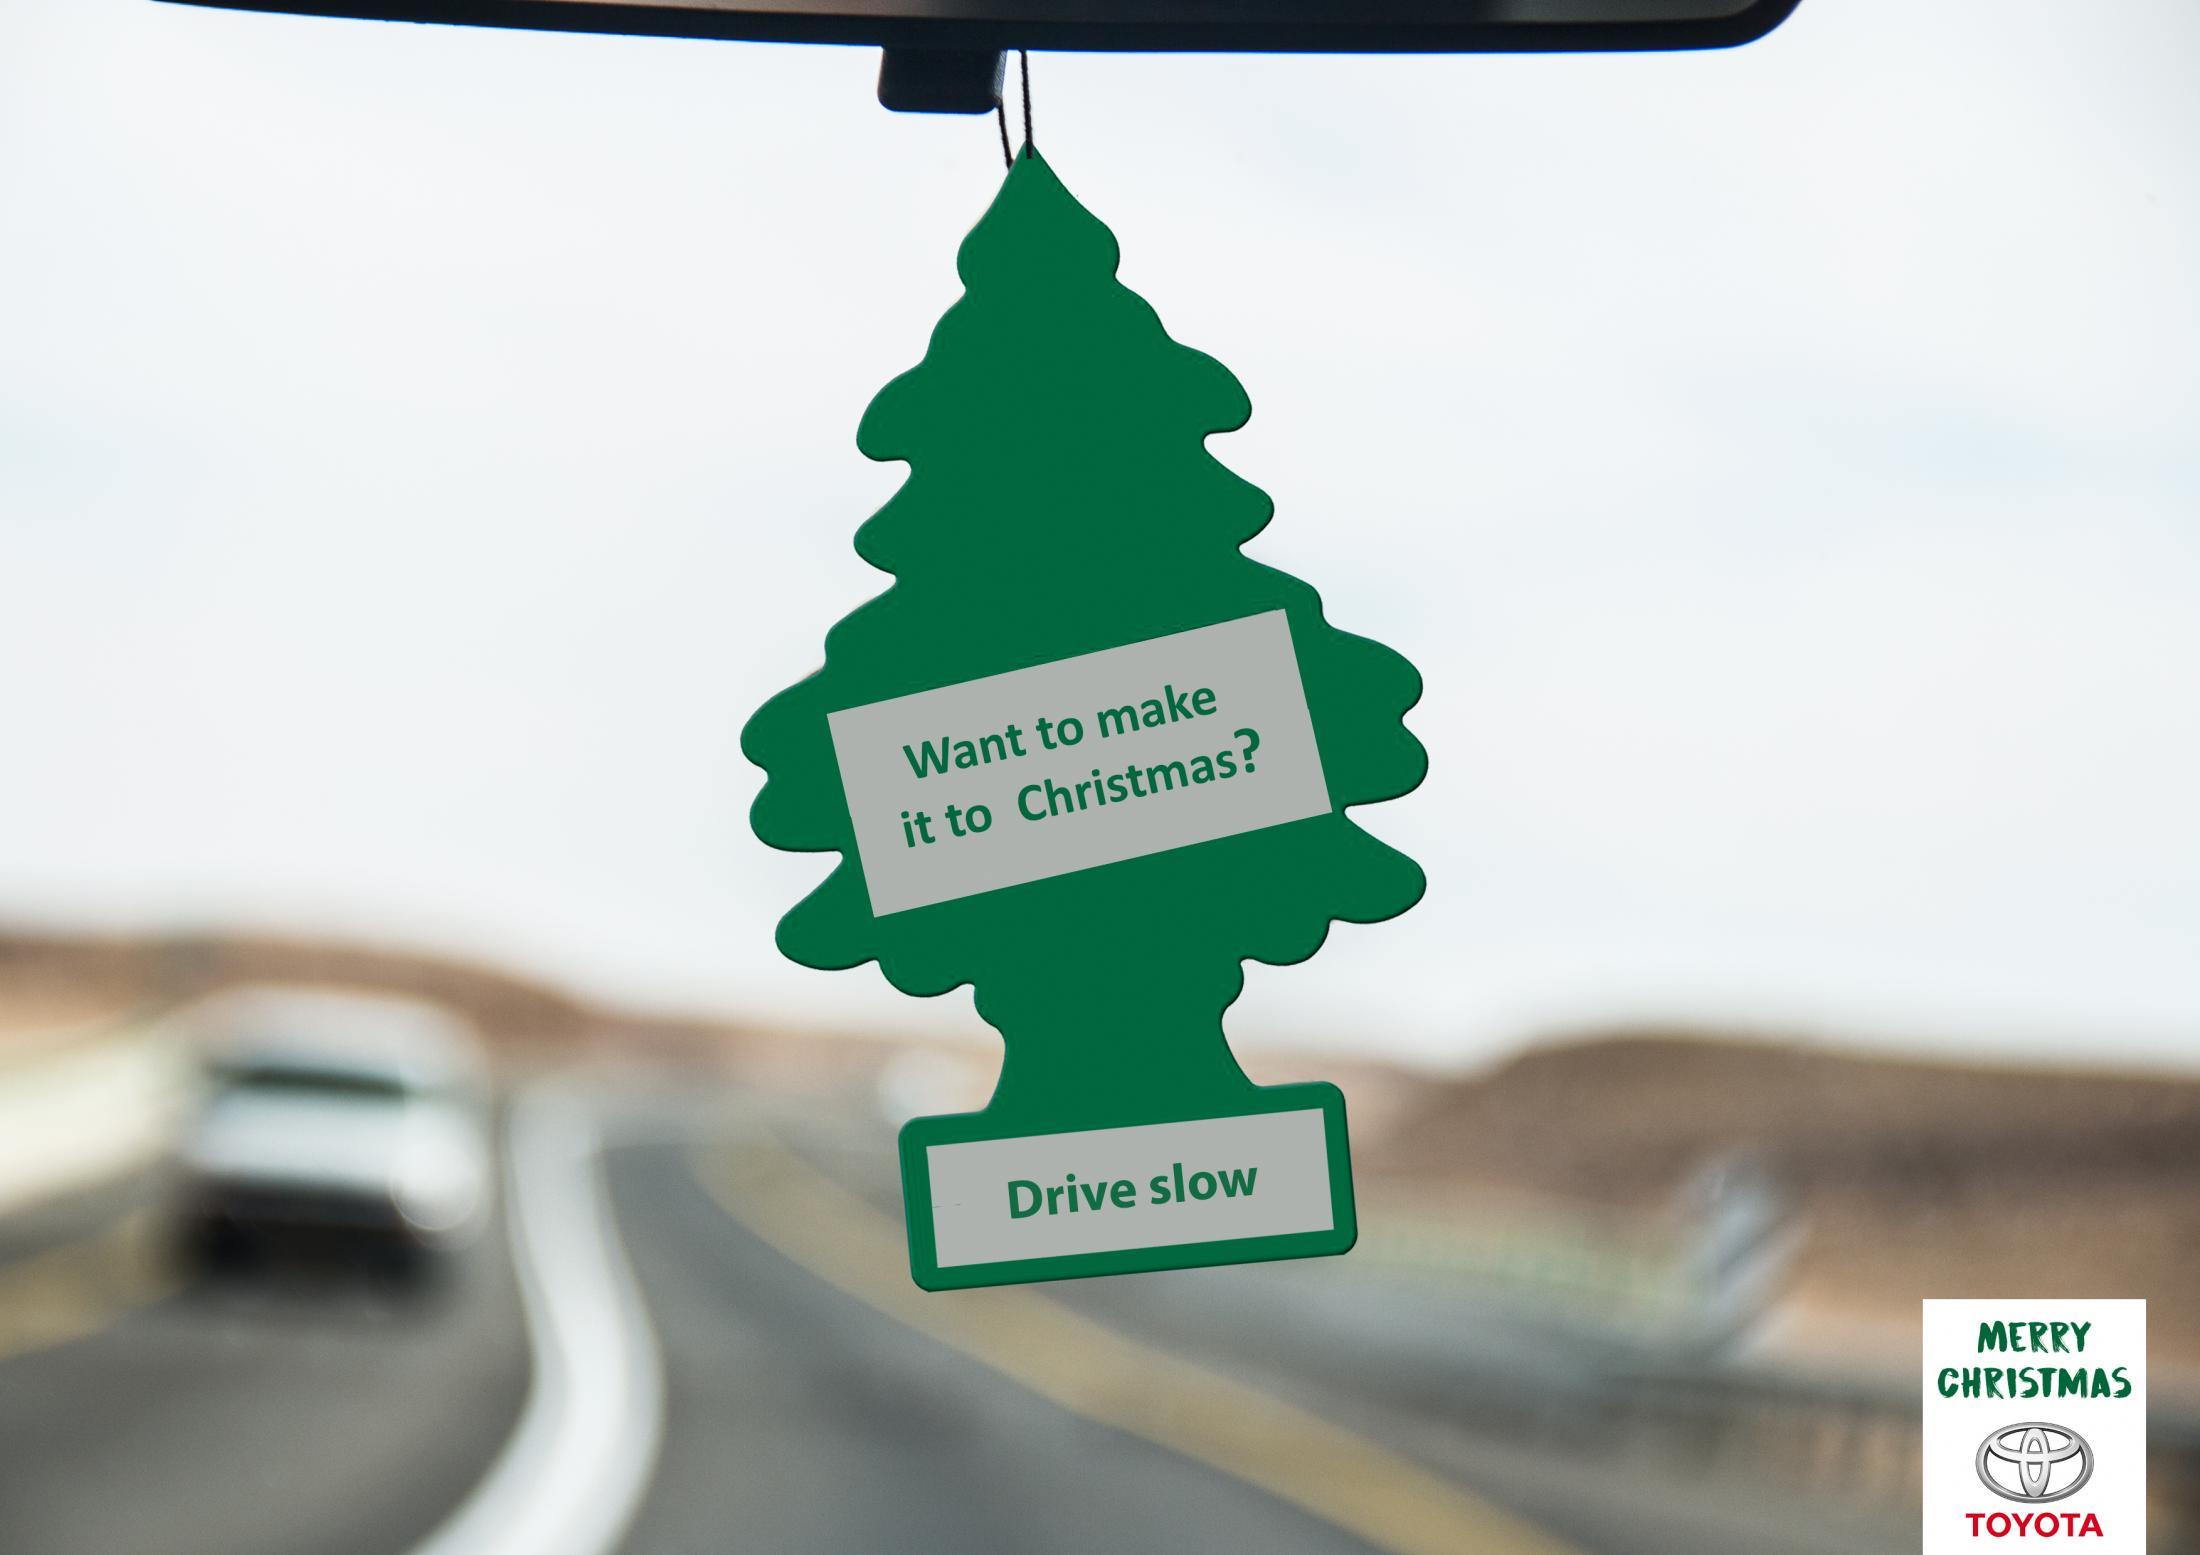 Toyota Print Ad - Merry Christmas